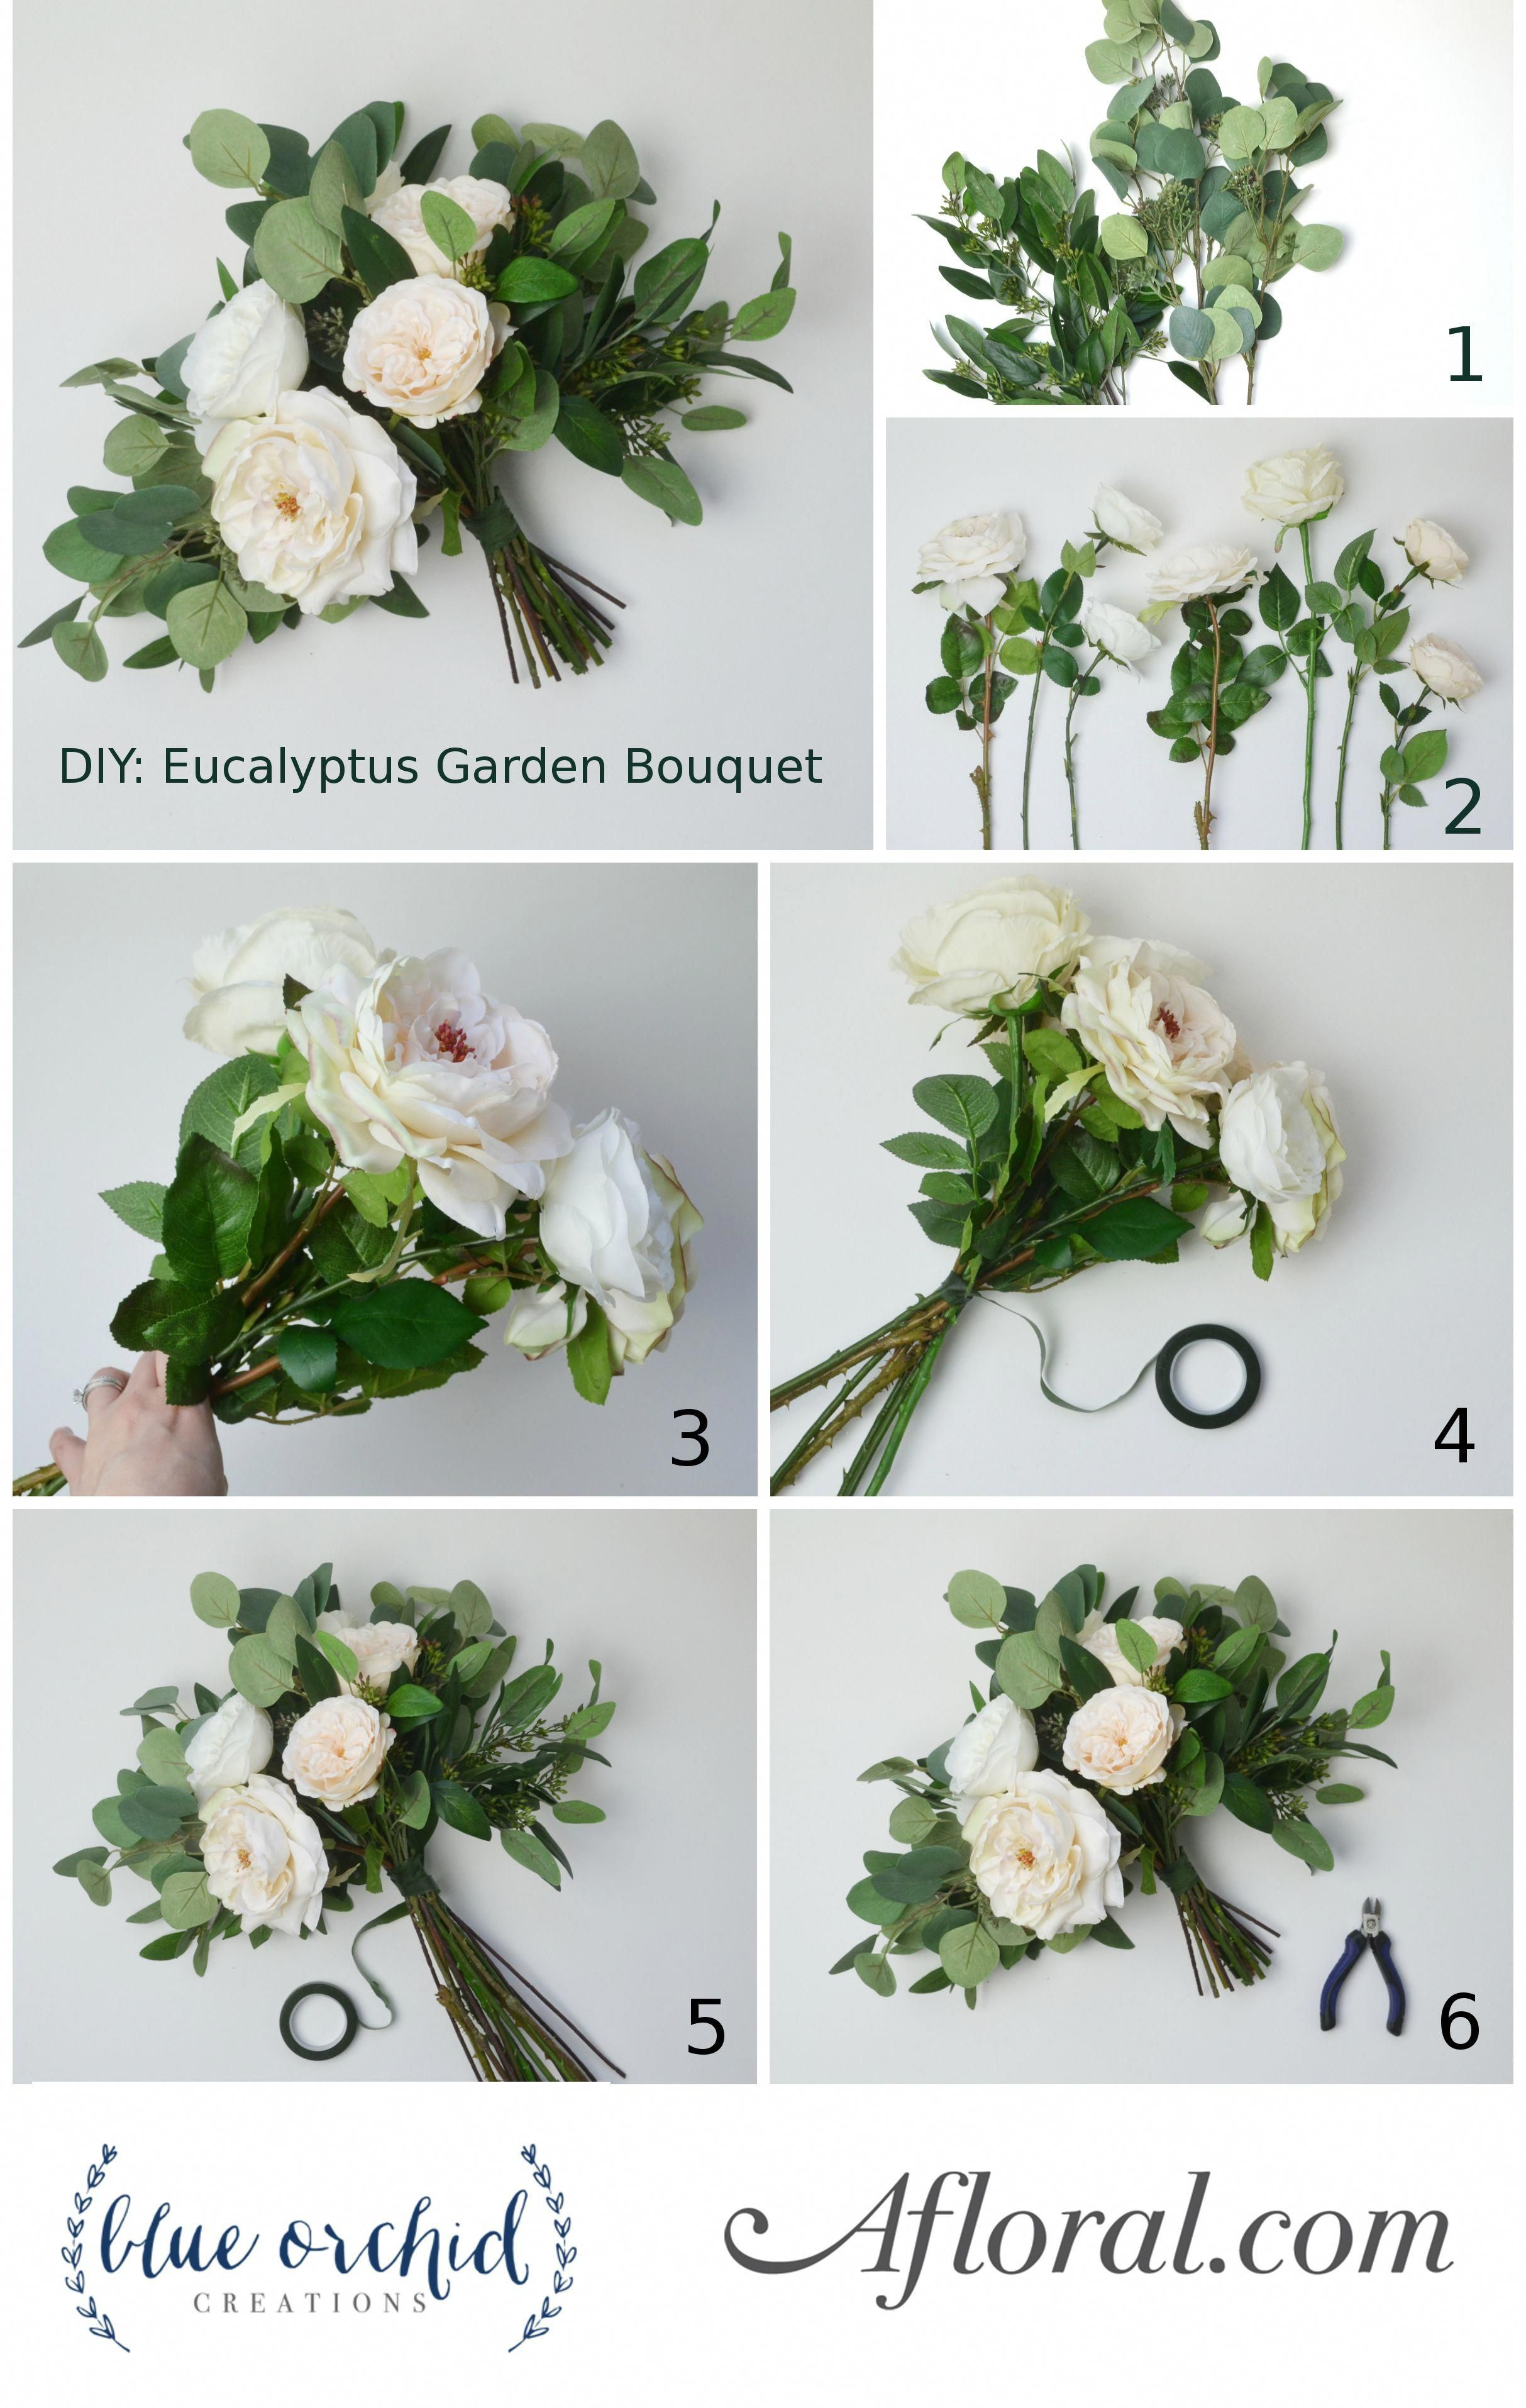 Diy wedding decorations vintage october 2018 DIY Eucalyptus Bouquet in   Wedding Planning  Pinterest